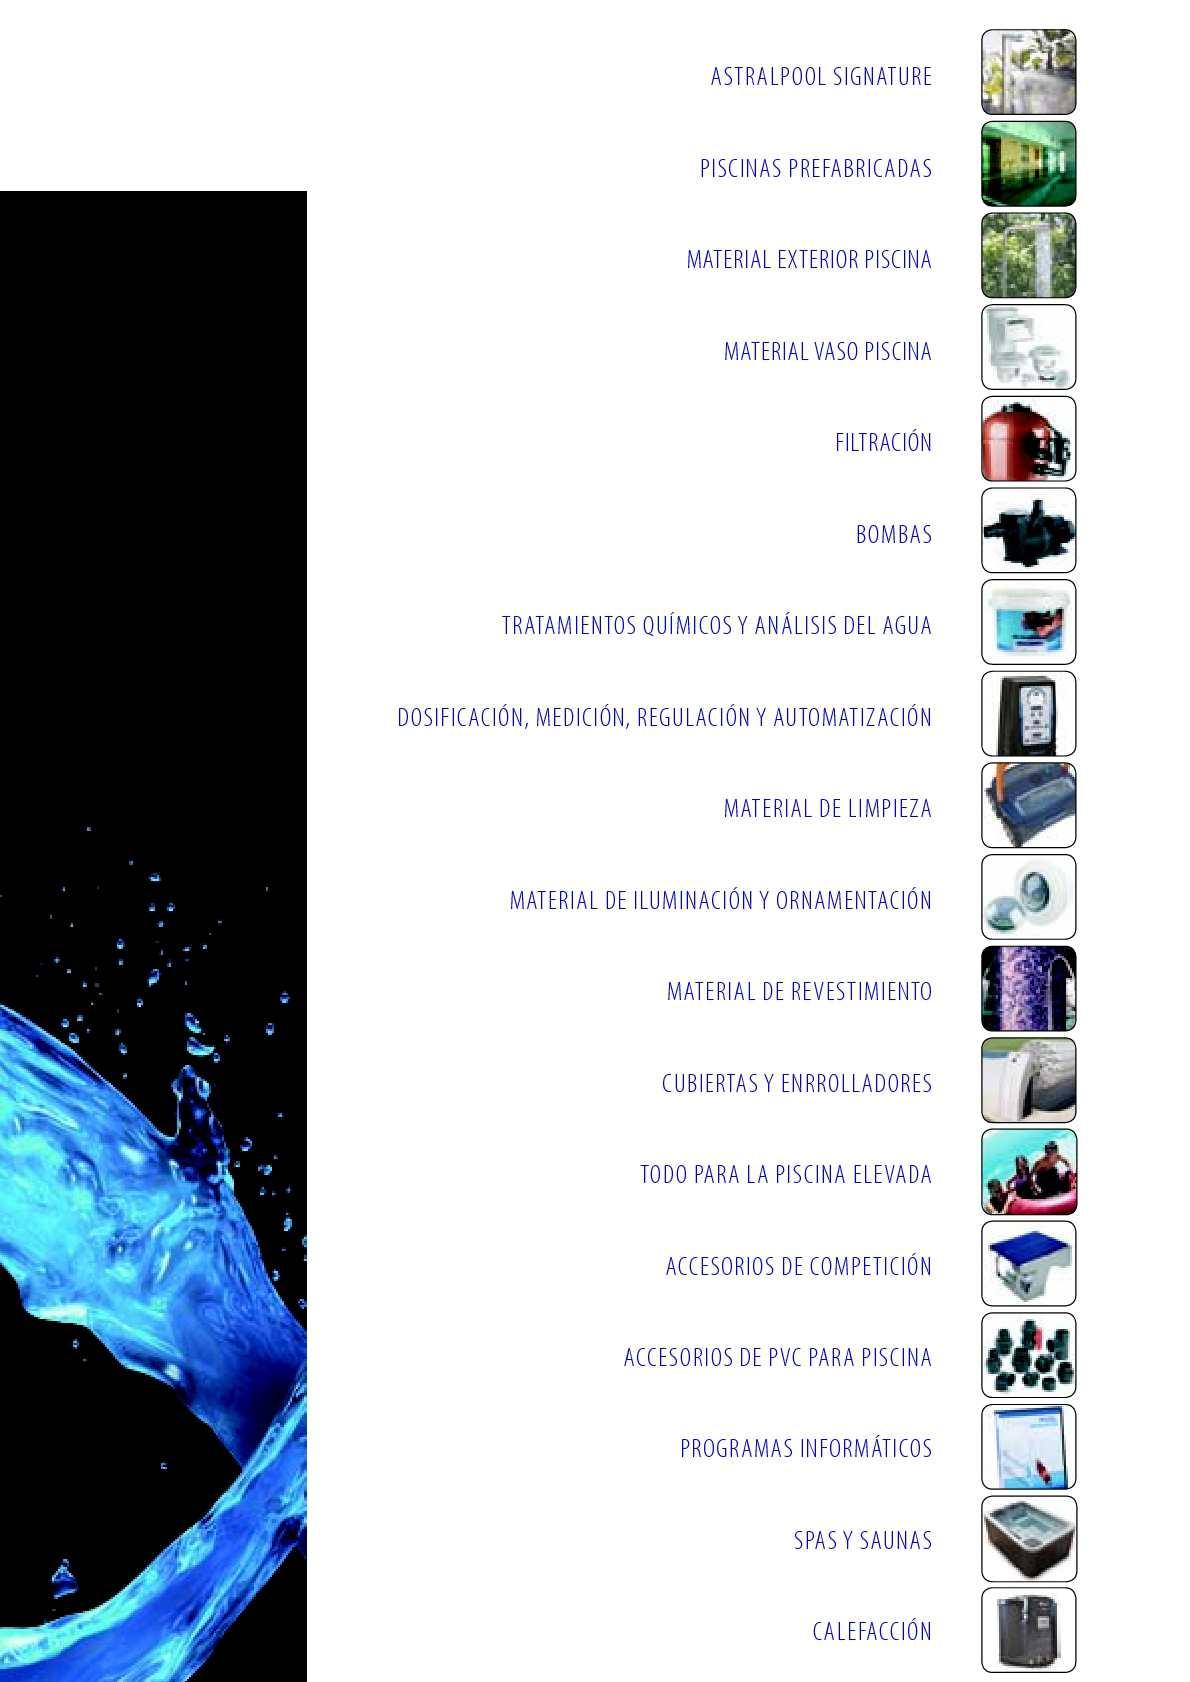 Calamo  Catalogo Tarifa Astralpool 2012